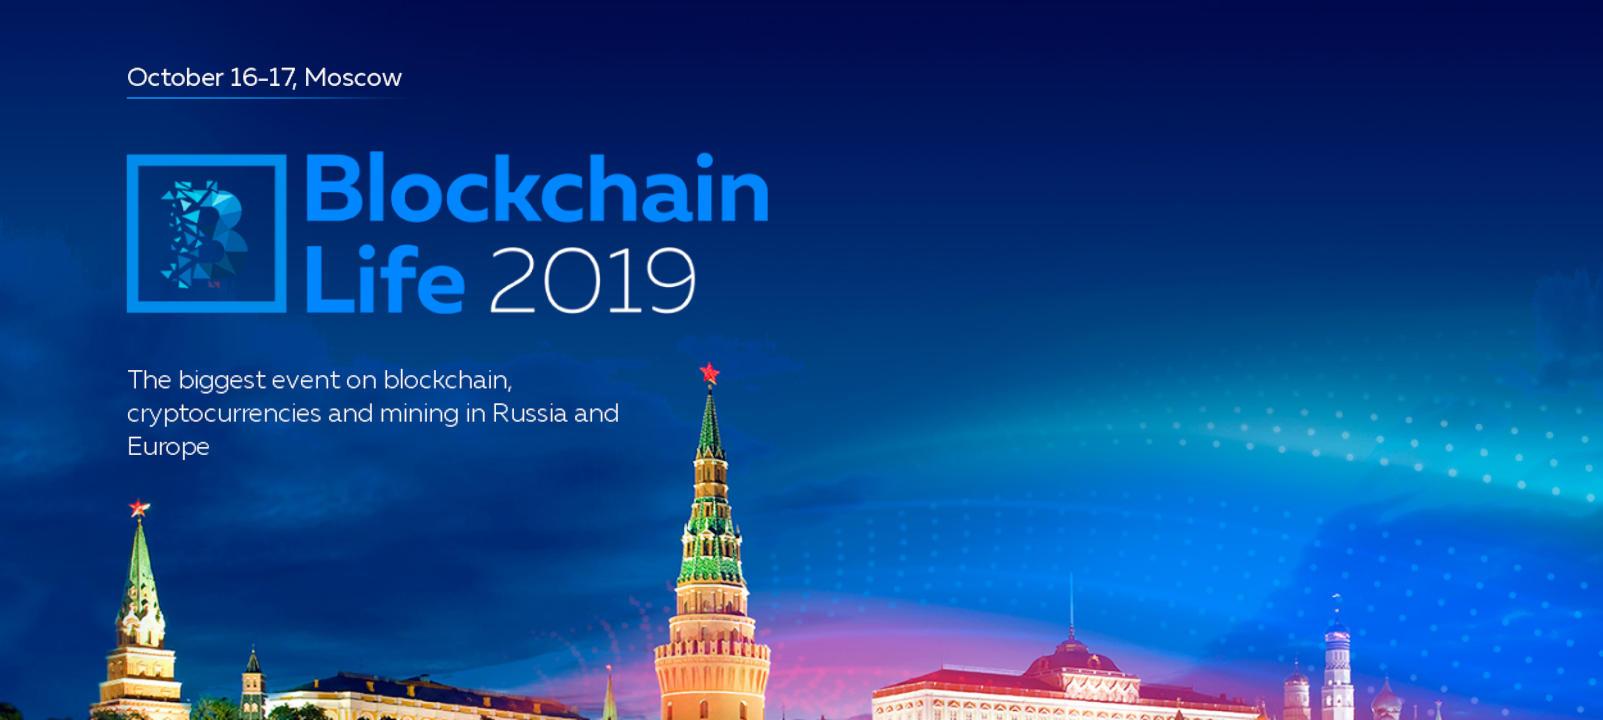 Blockchain Life 2019 Global Rusia